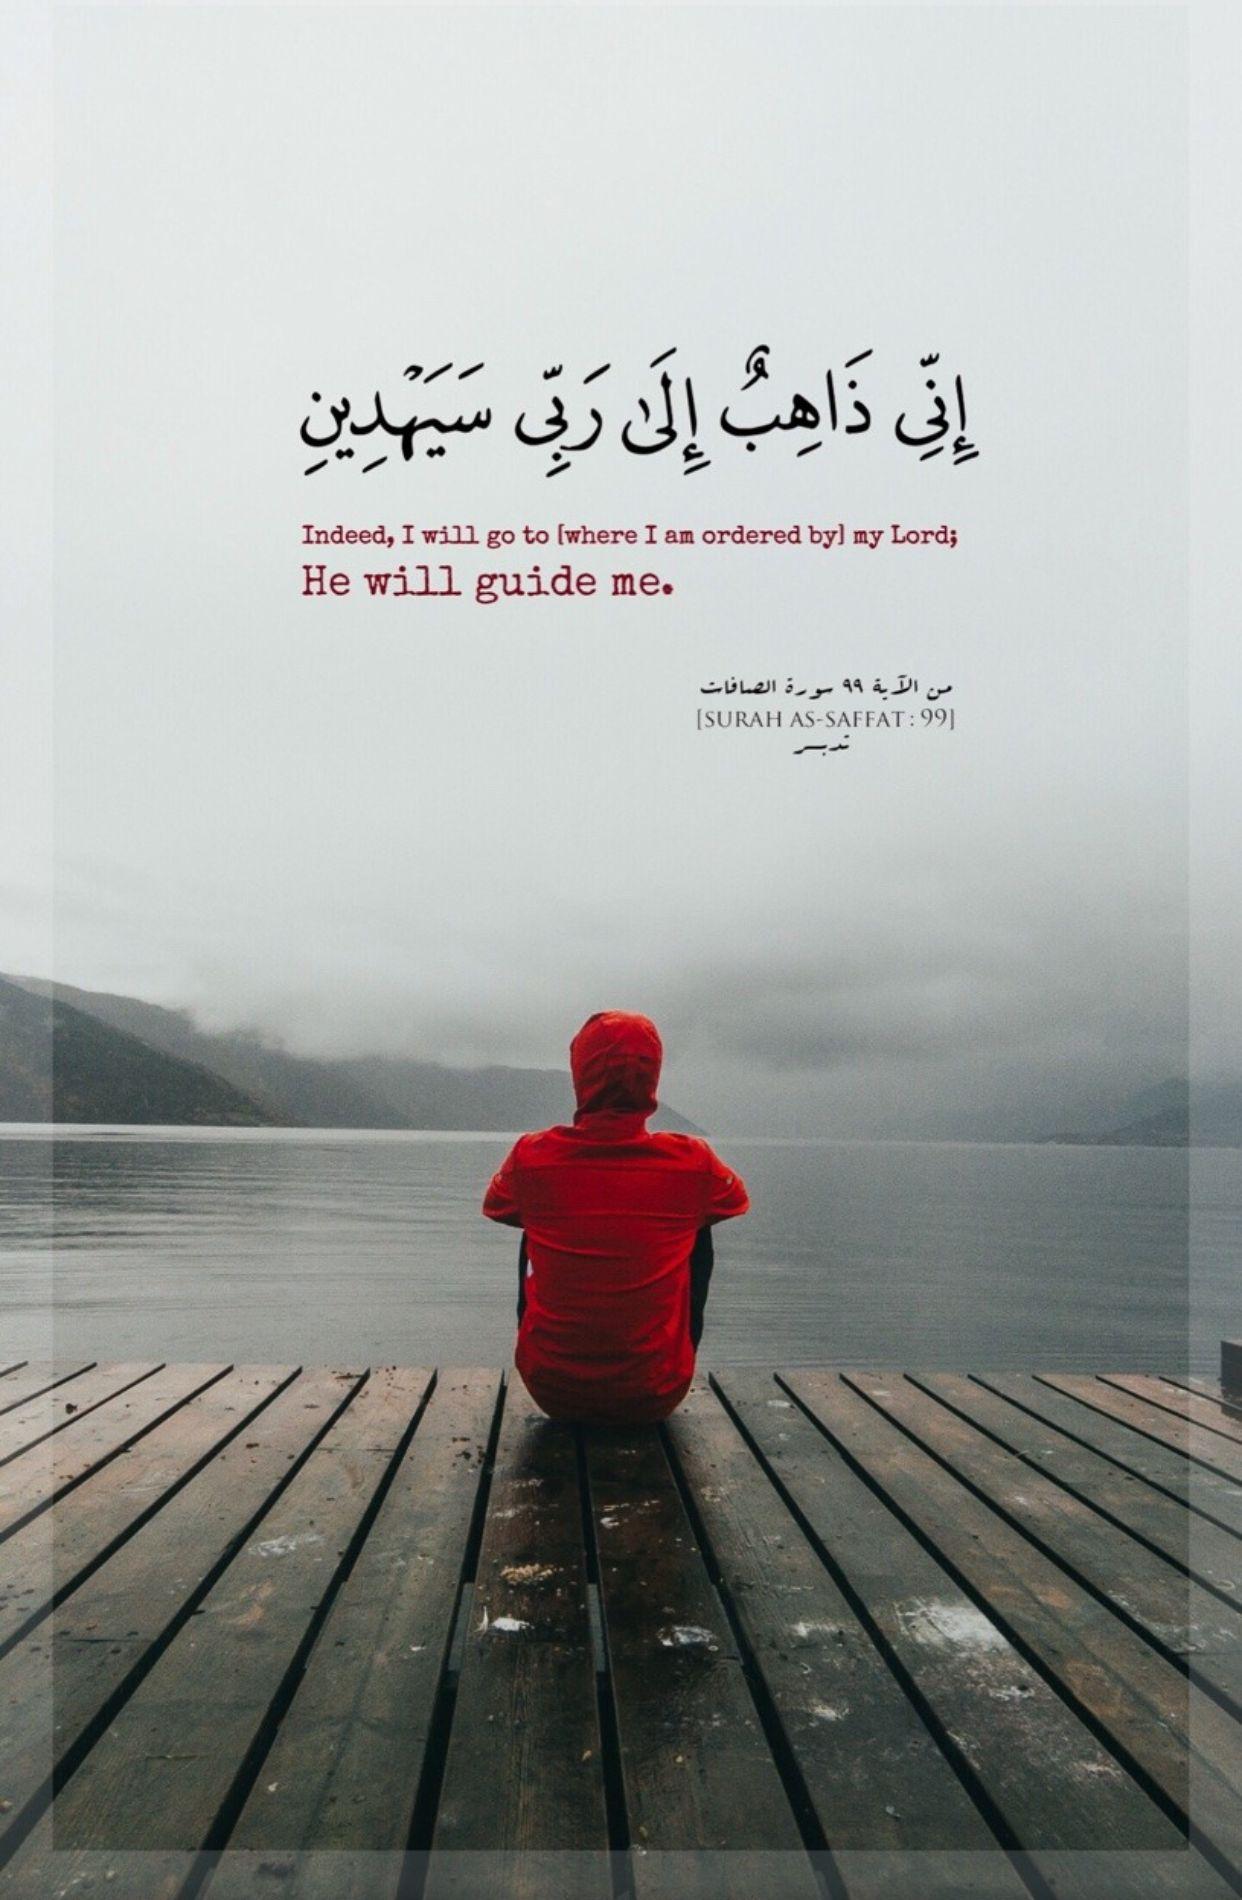 Inshalah Ameen Beautiful Quran Quotes Beautiful Islamic Quotes Quran Verses